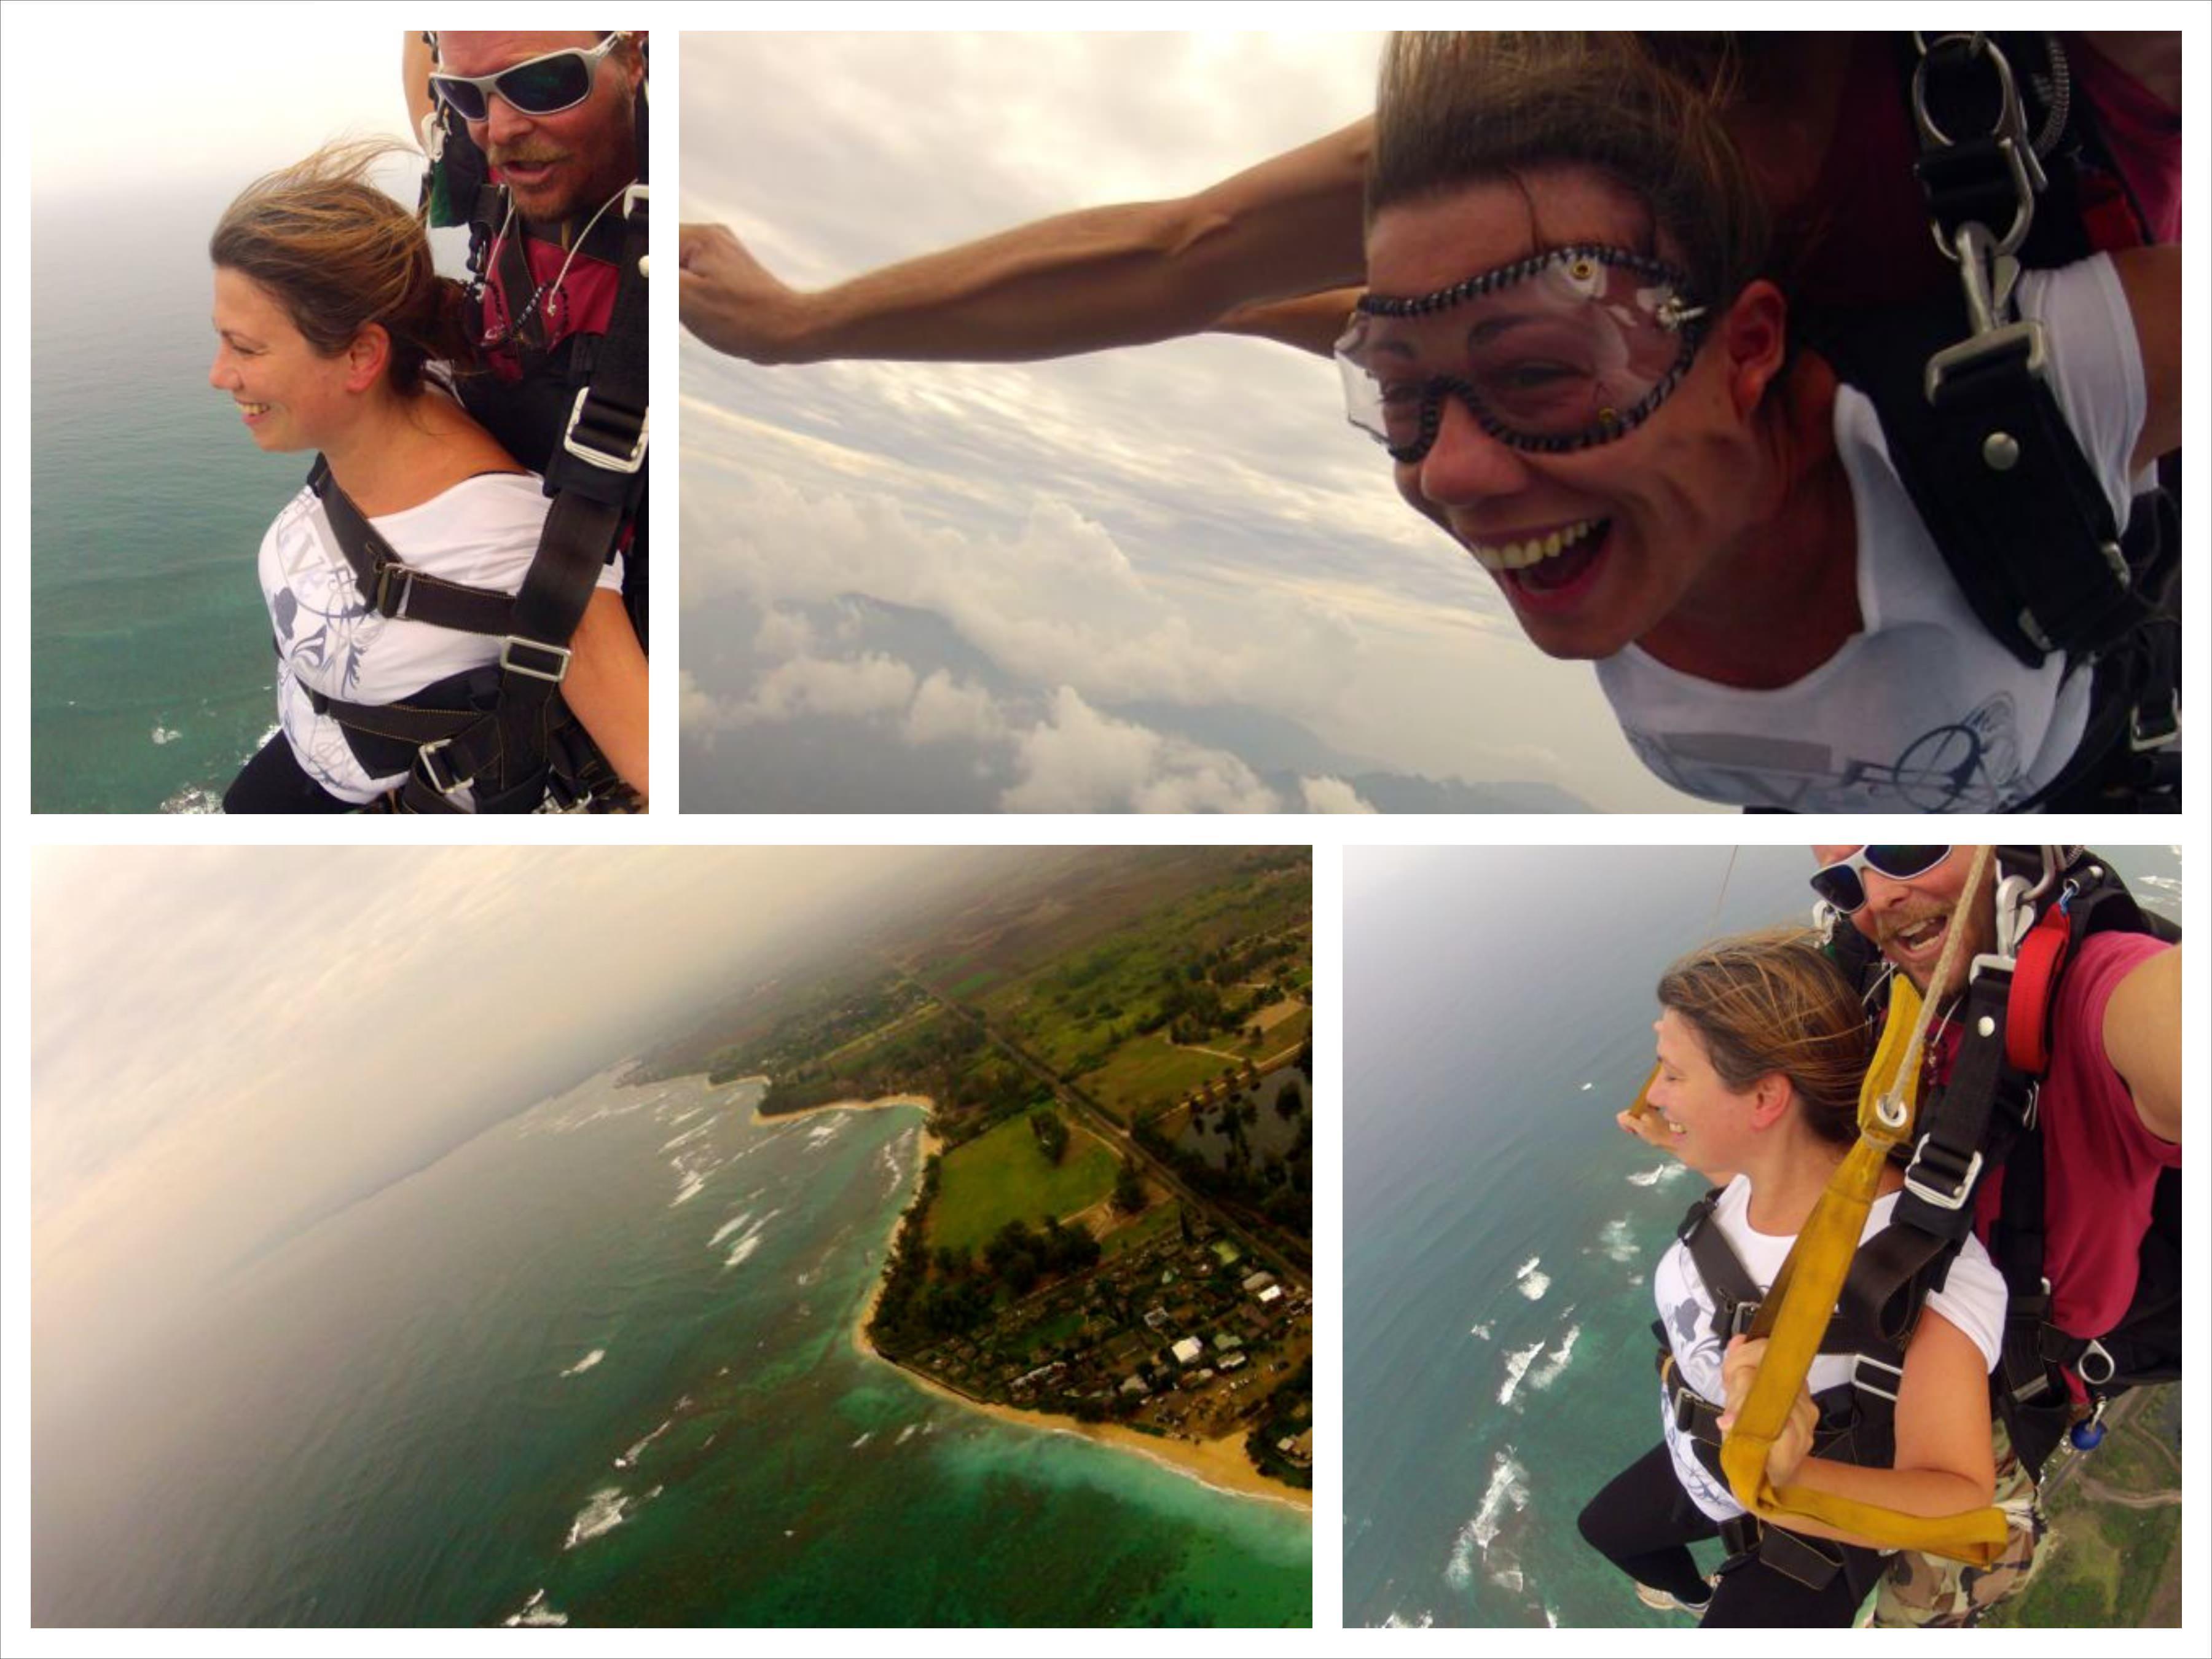 Skydive Hawaii Collage